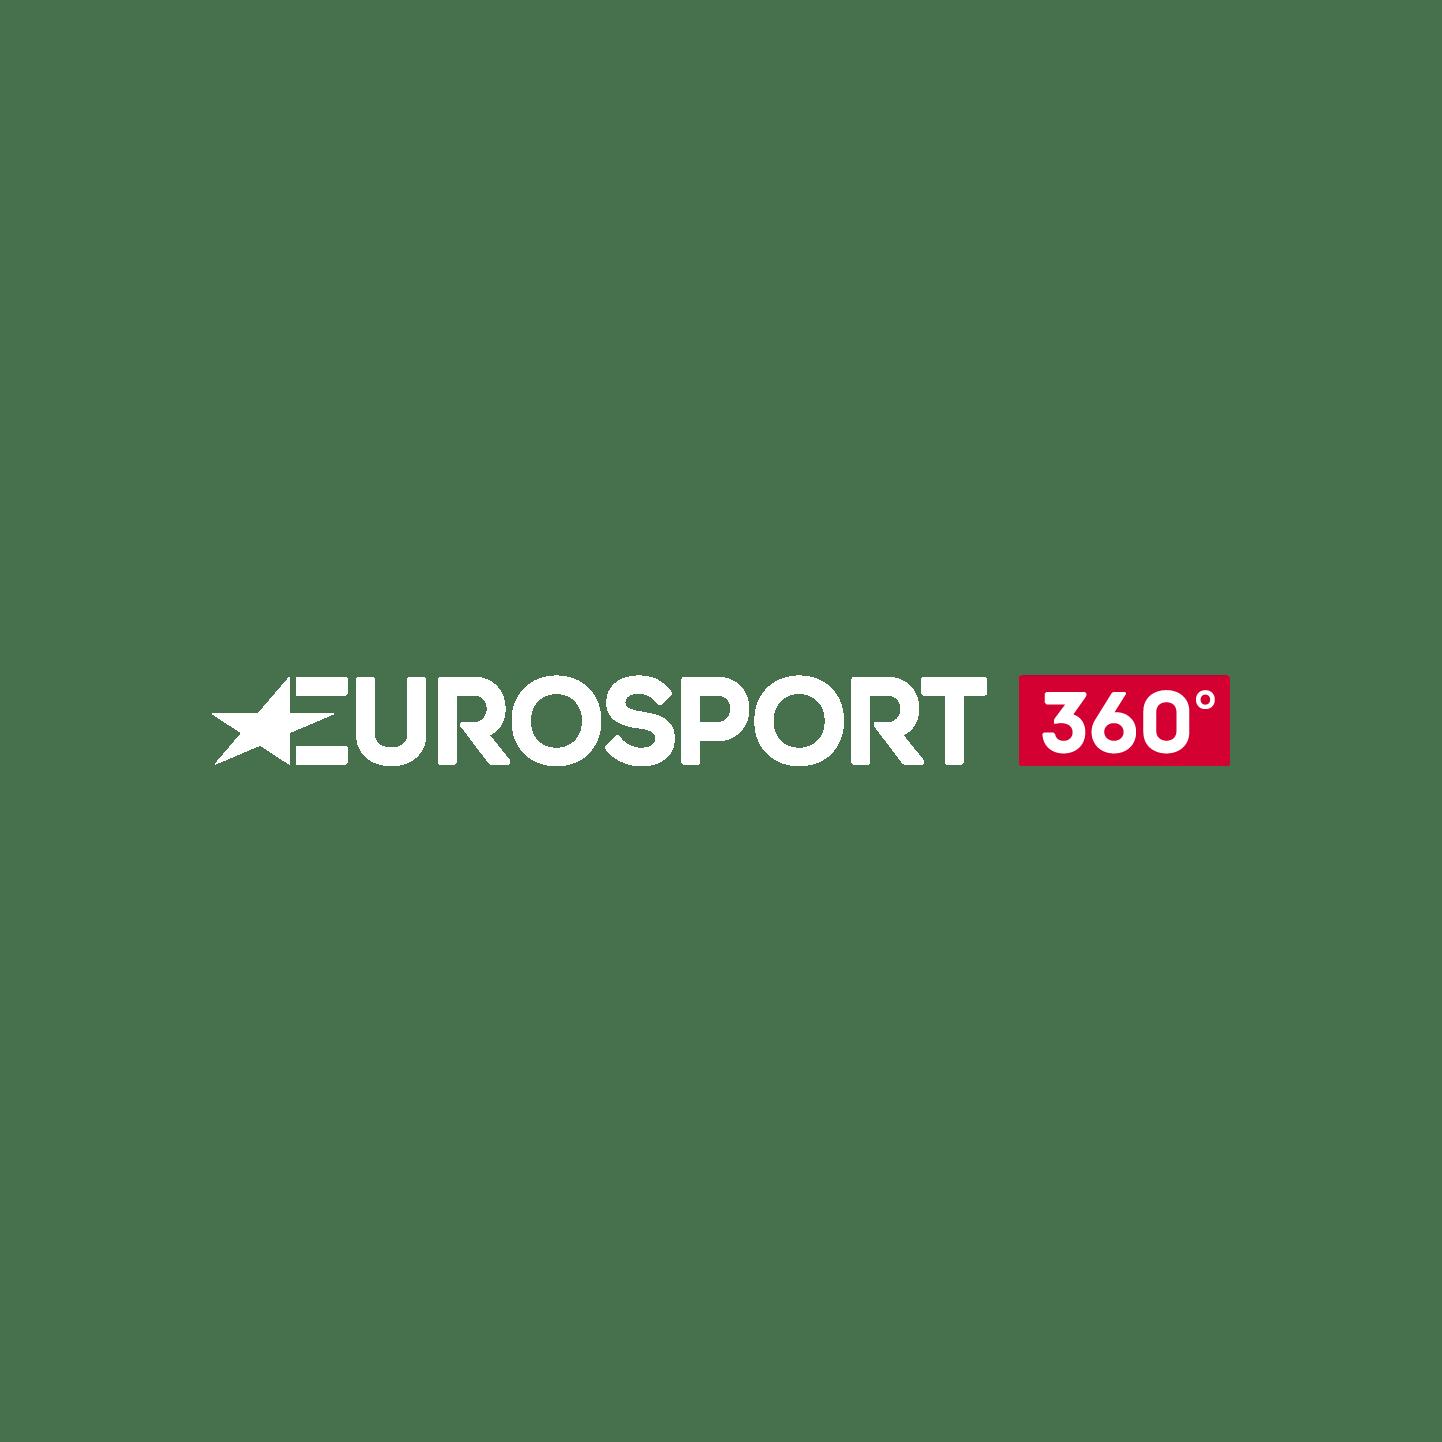 Logo Eurosport 360